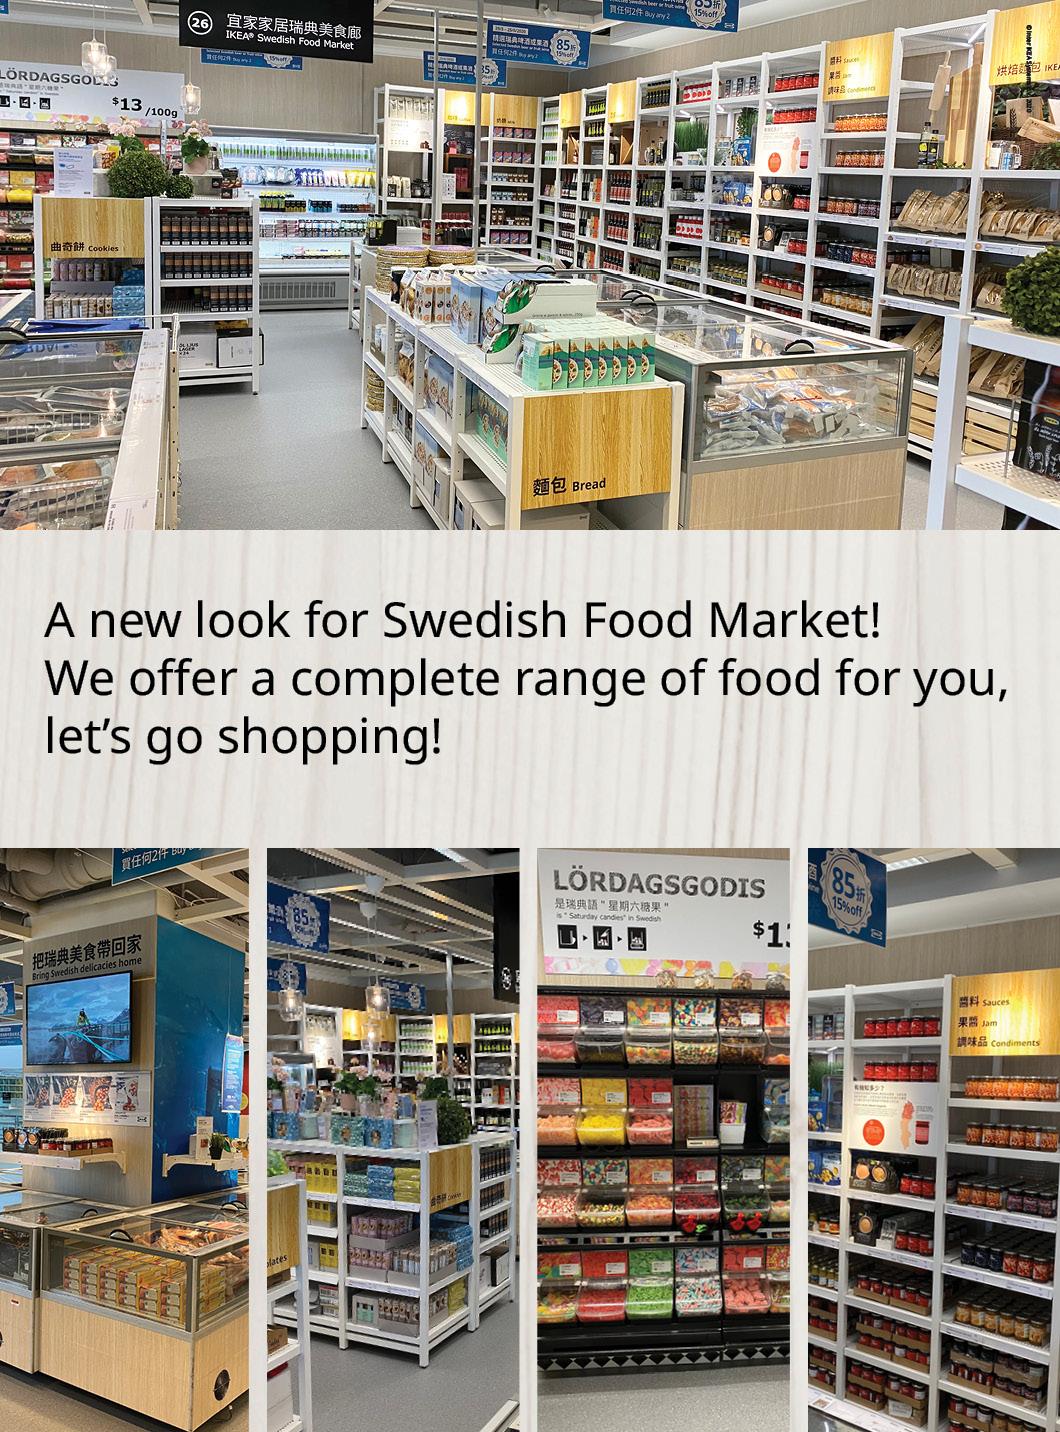 ikea-shatin-A-new-swedish-food-market